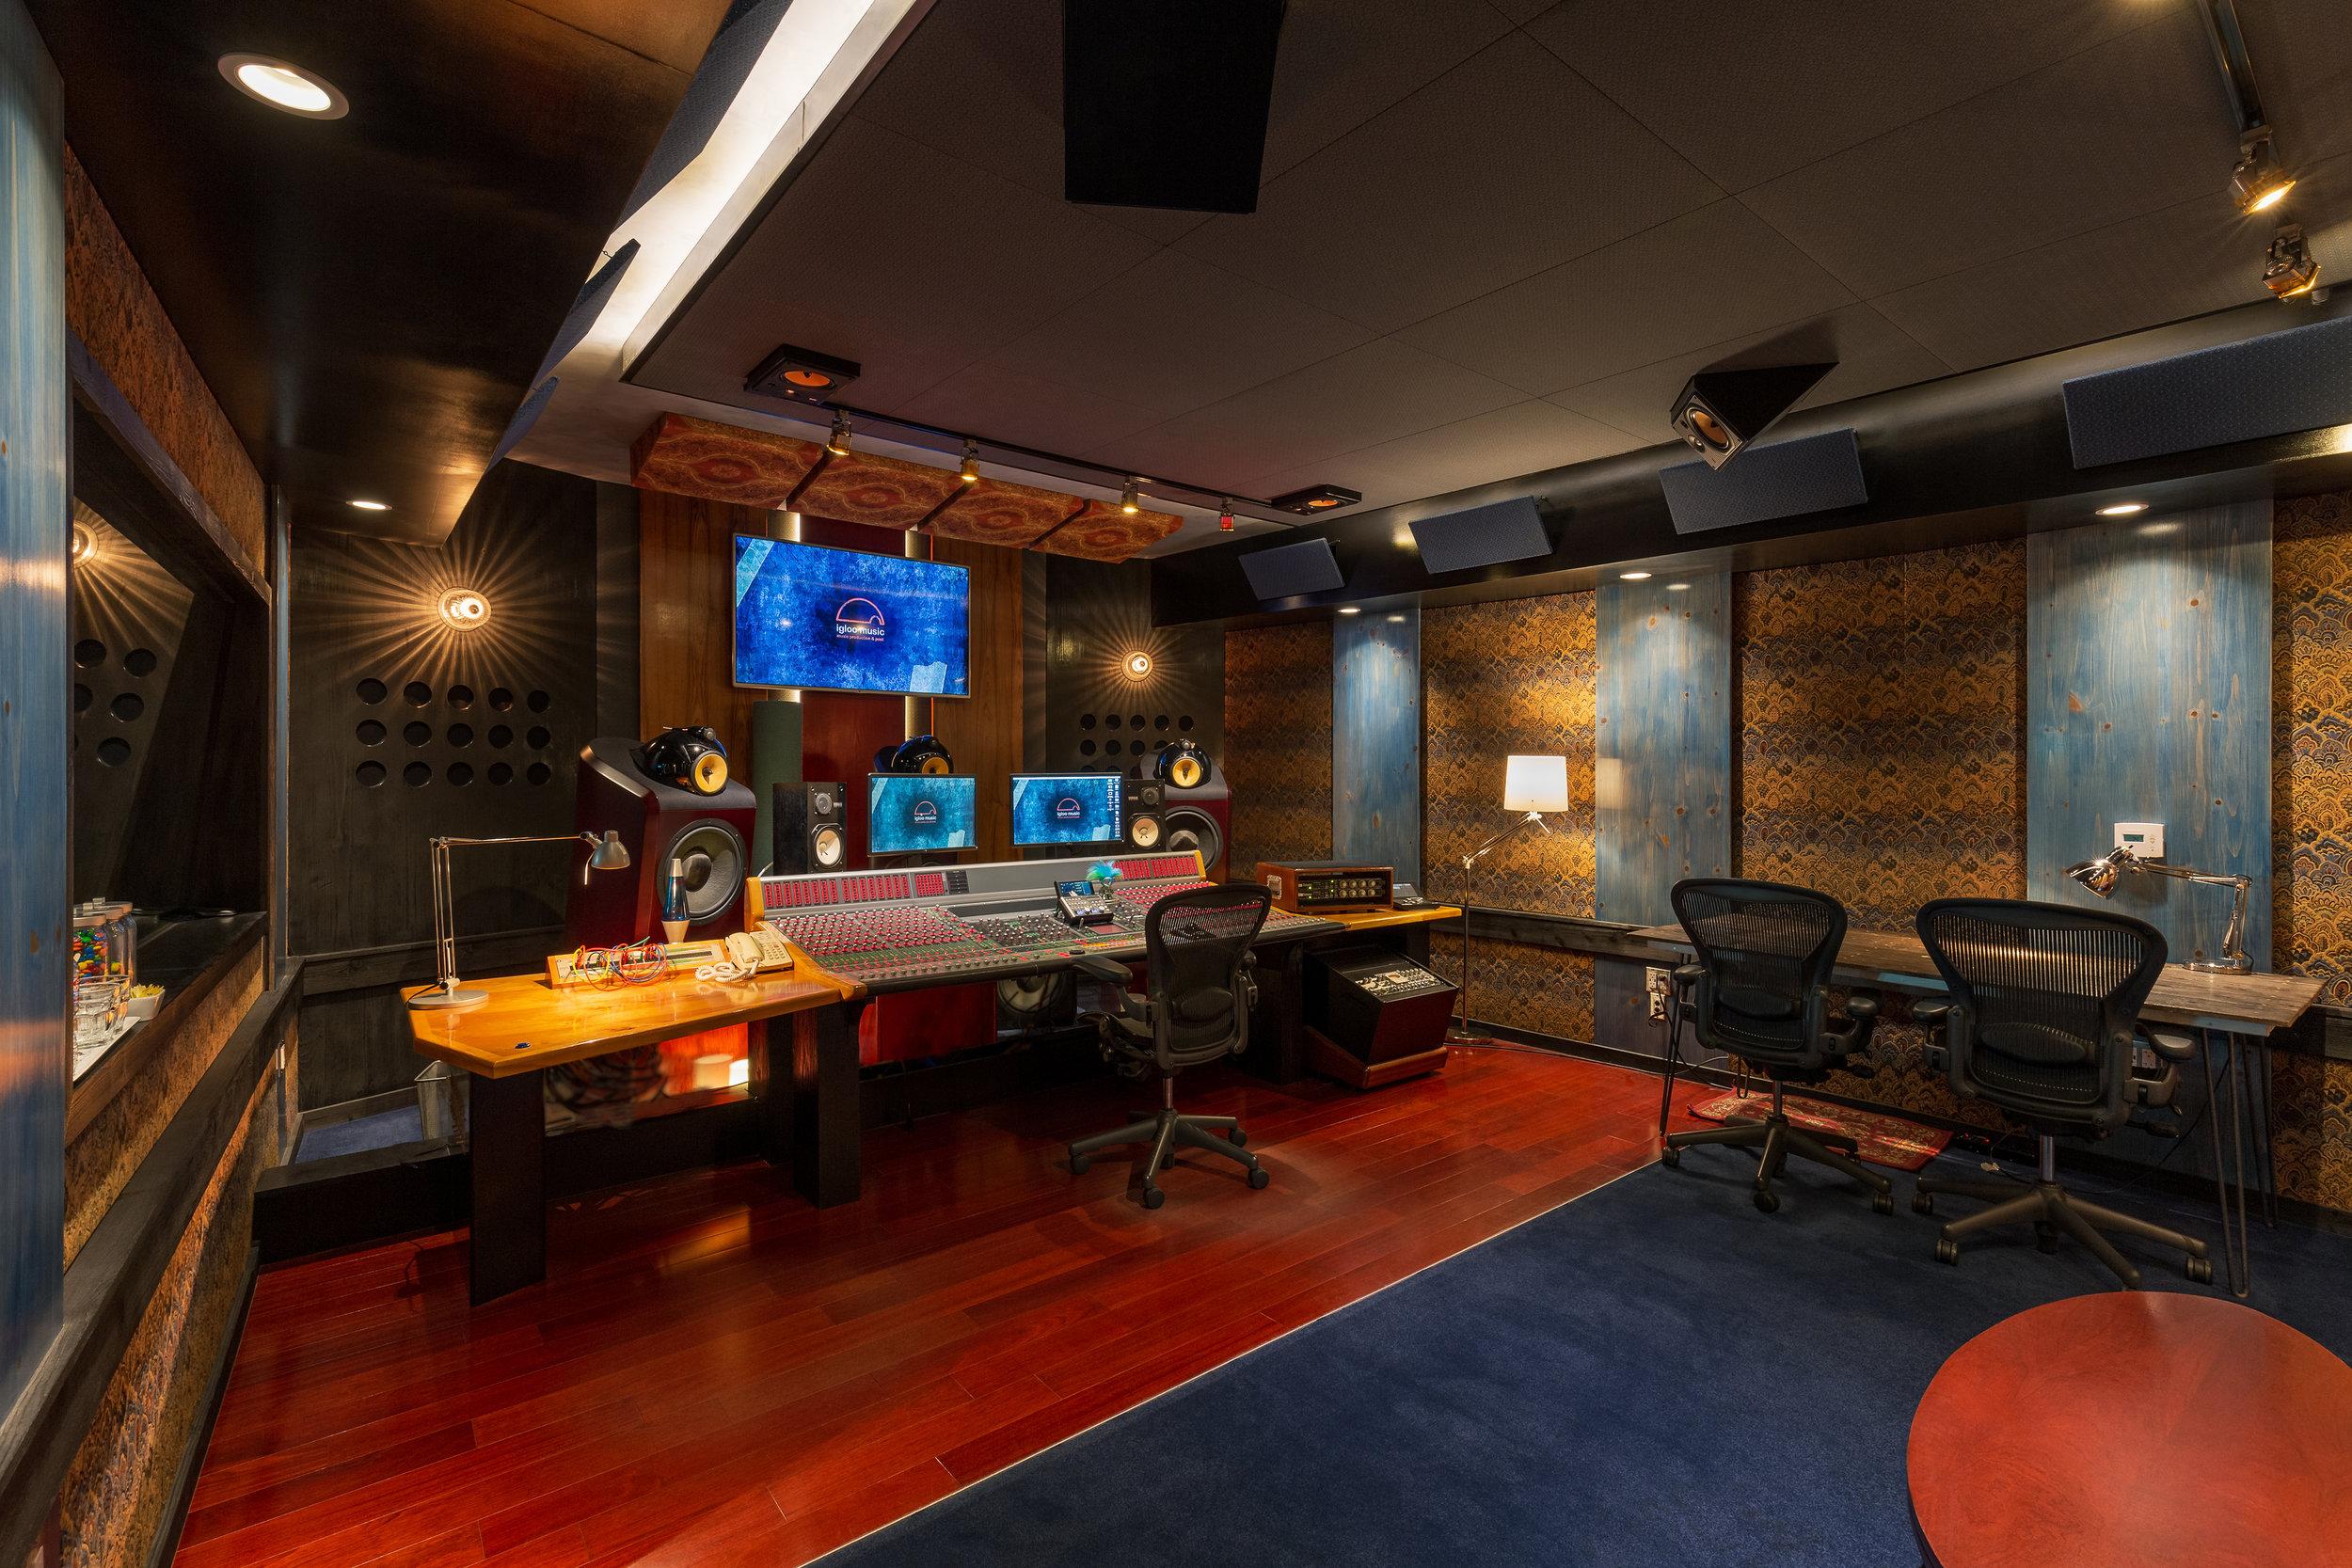 01_M_IglooMusicStudios_Control_Room_E.gb.jpg